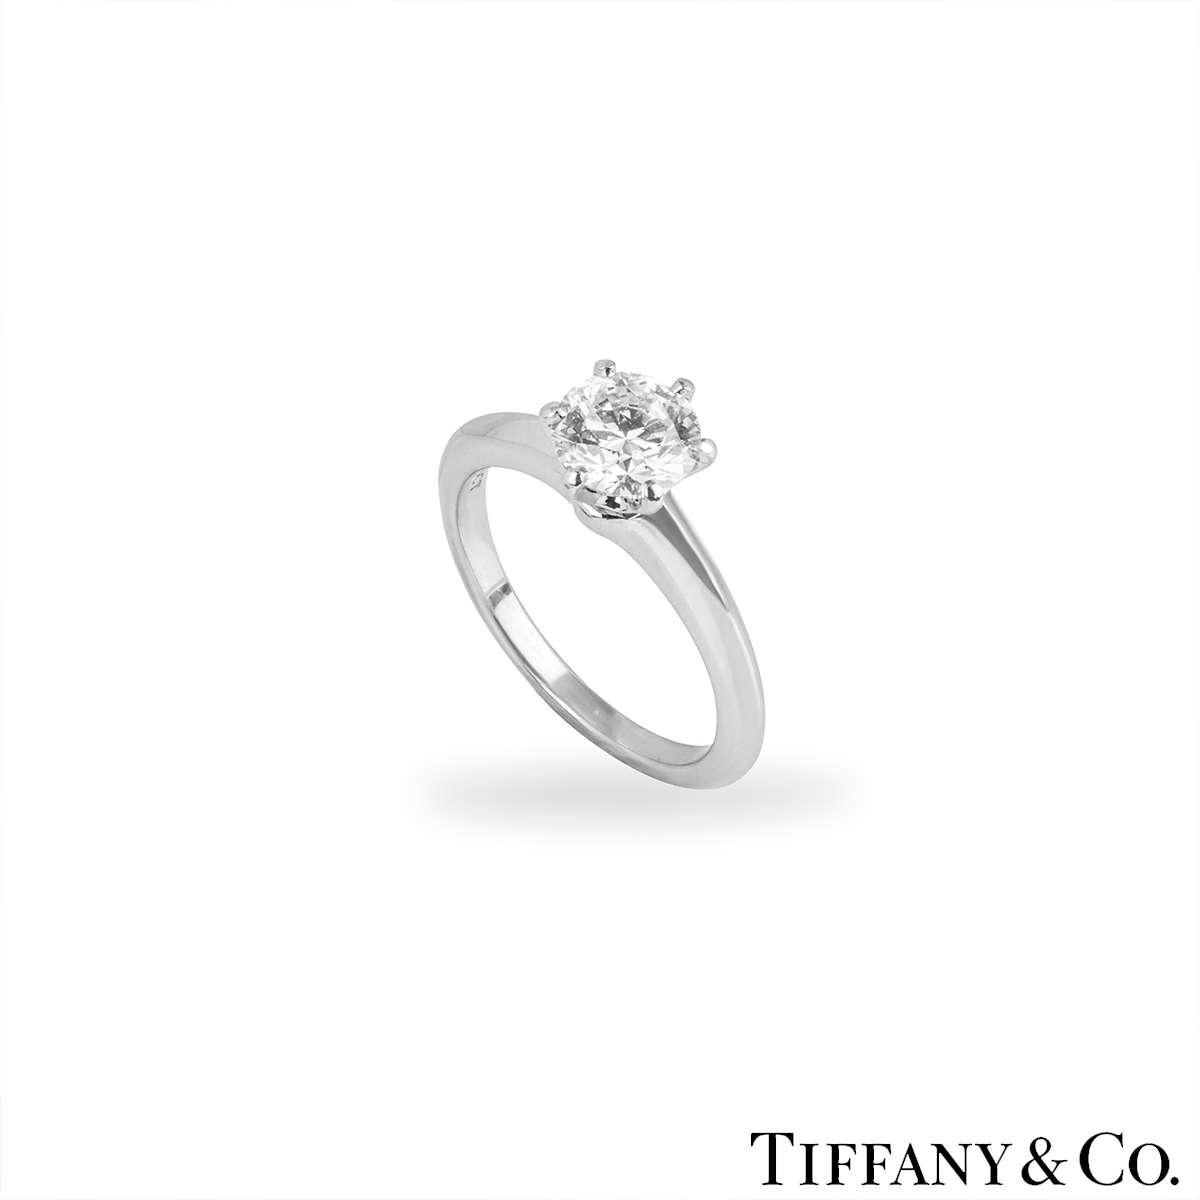 Tiffany & Co. Platinum Diamond Setting Ring 1.16ct I/VVS1 XXX